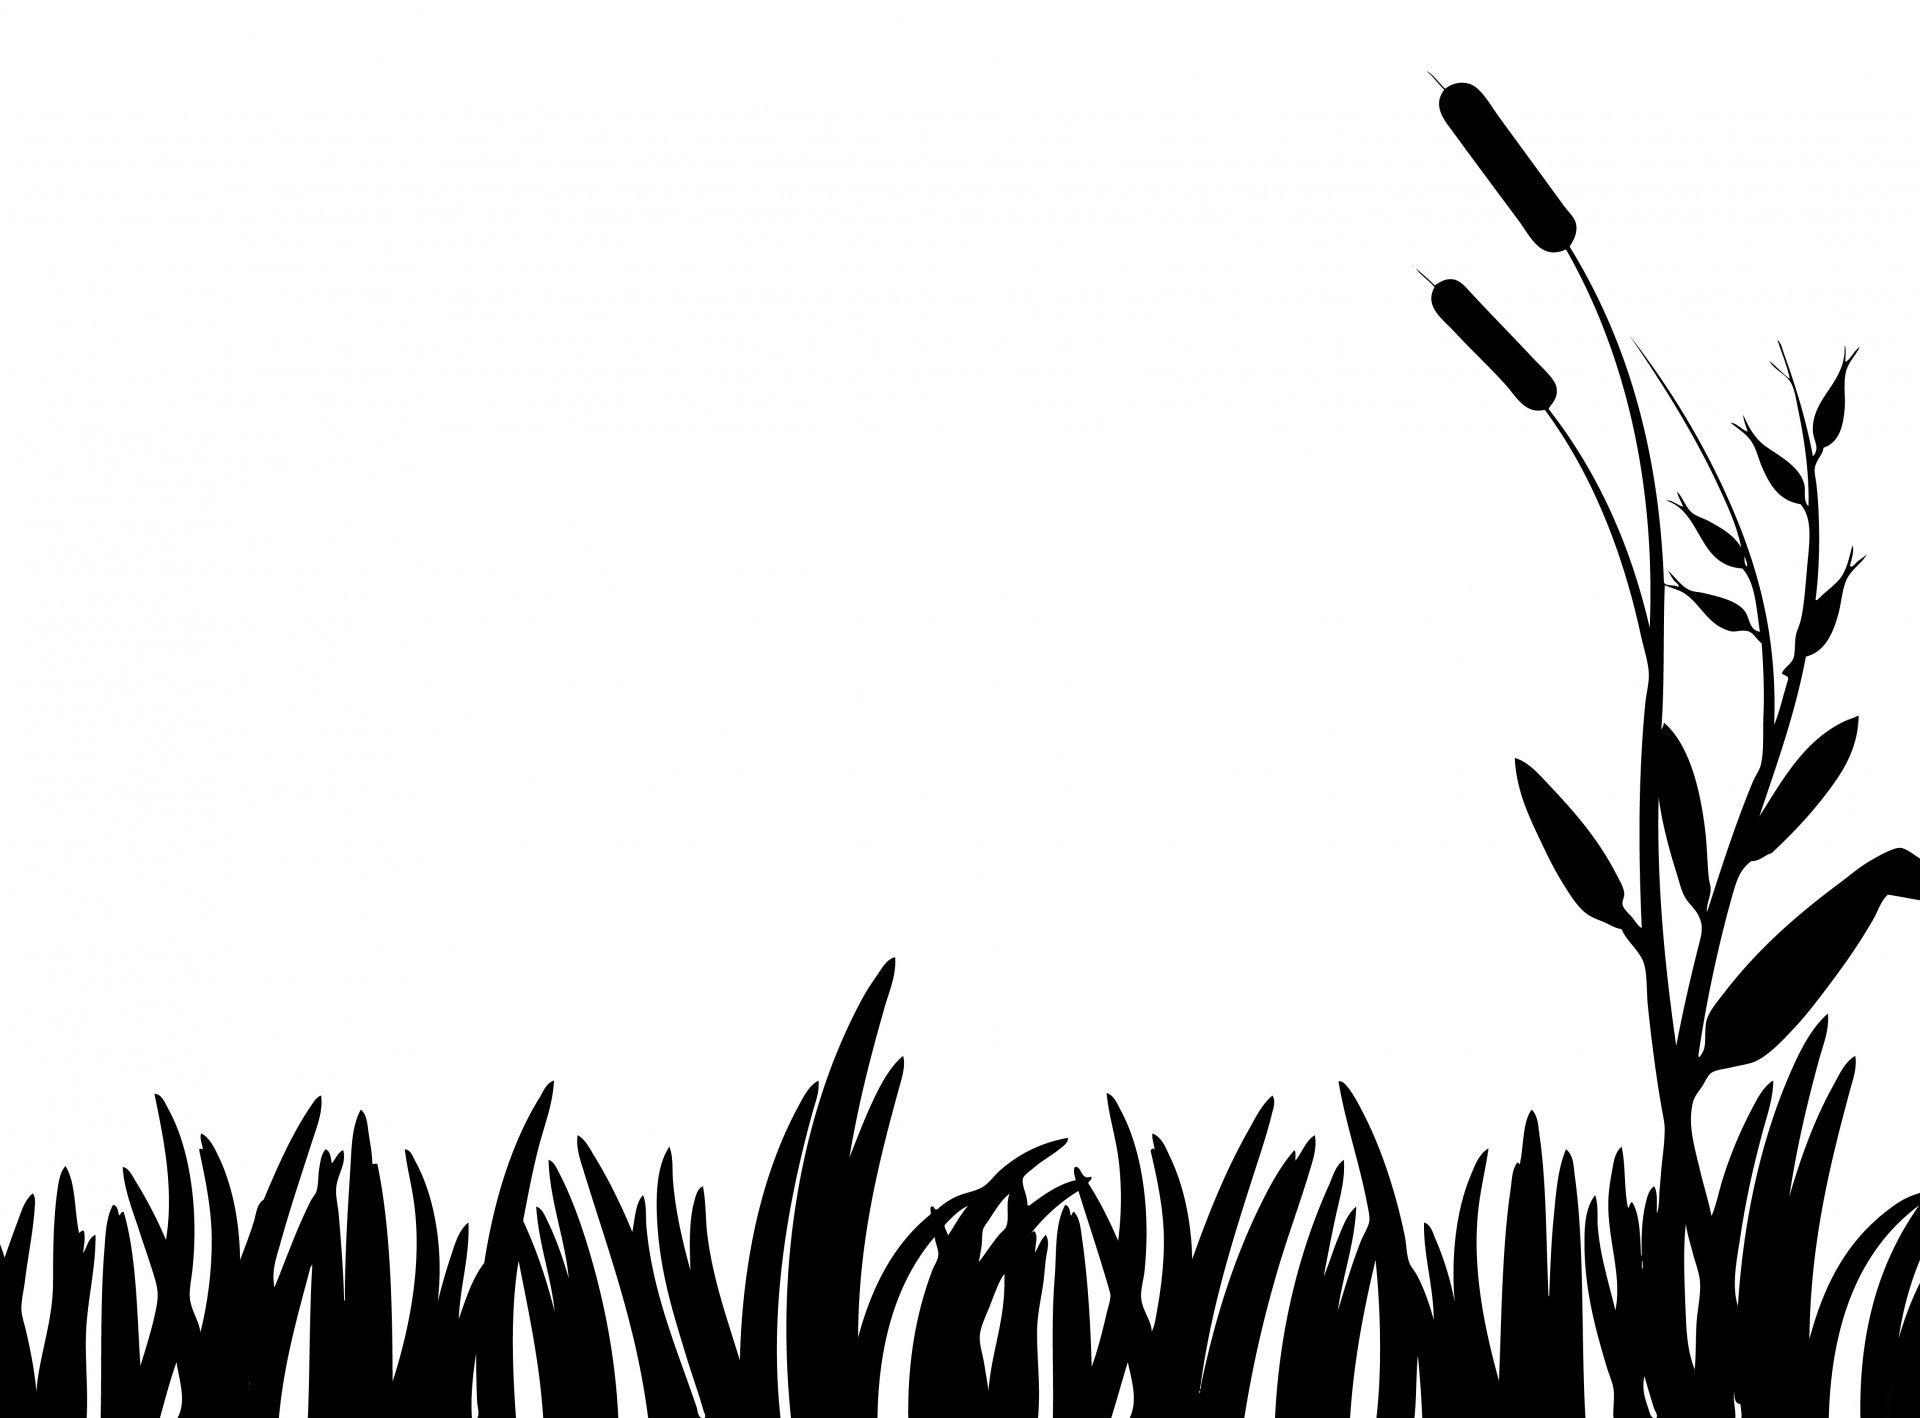 Grass Silhouette Clipart.